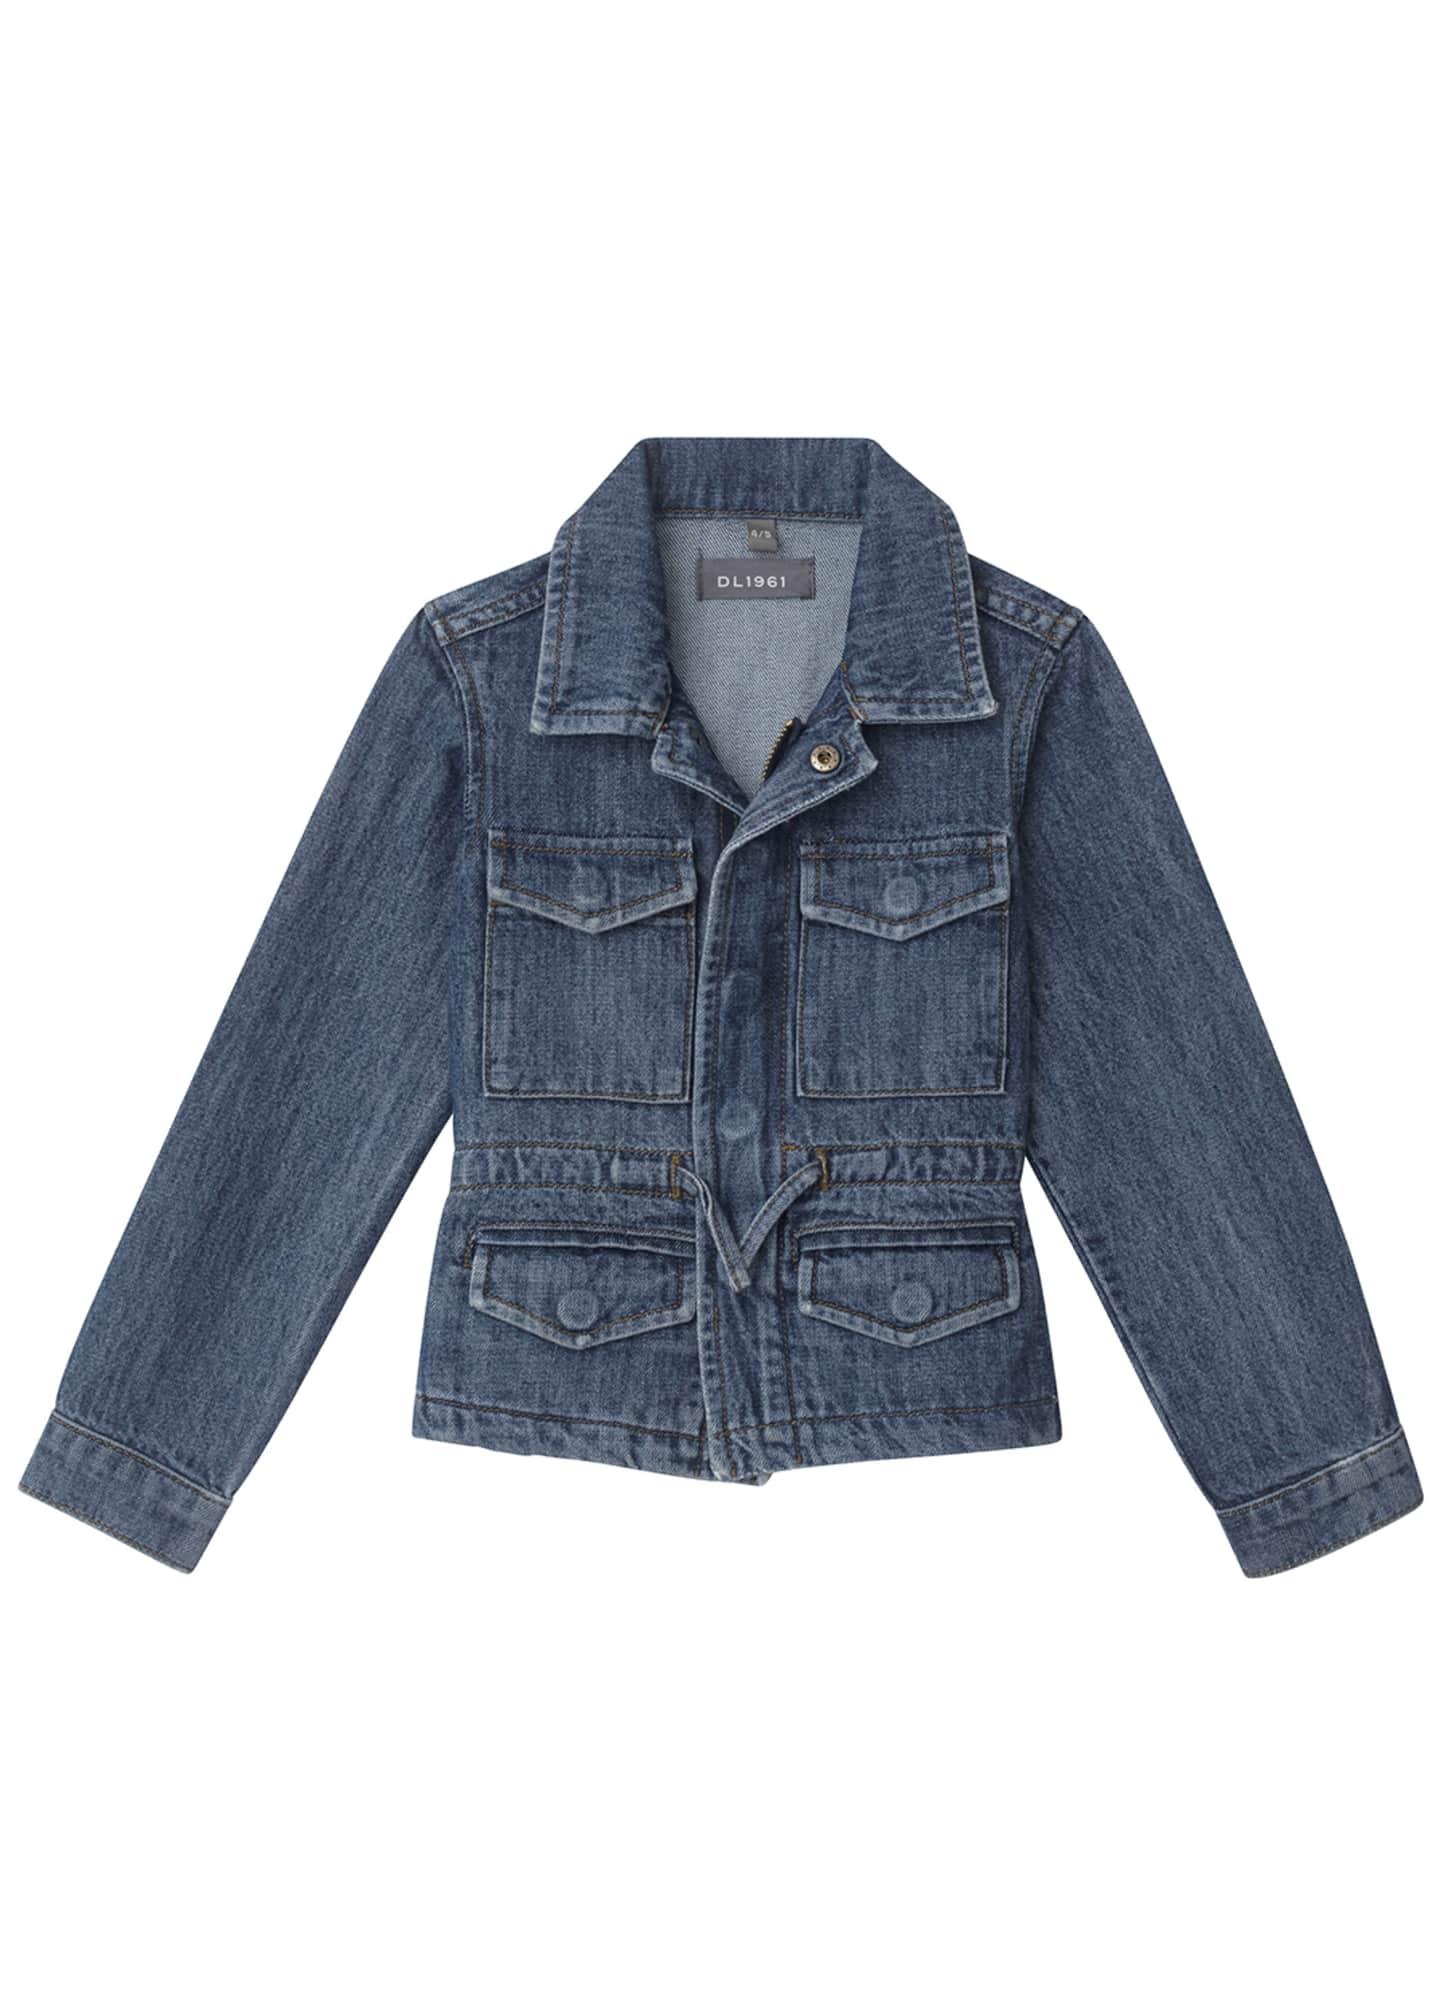 DL 1961 Girl's Rocco Parka Jacket, Size S-L